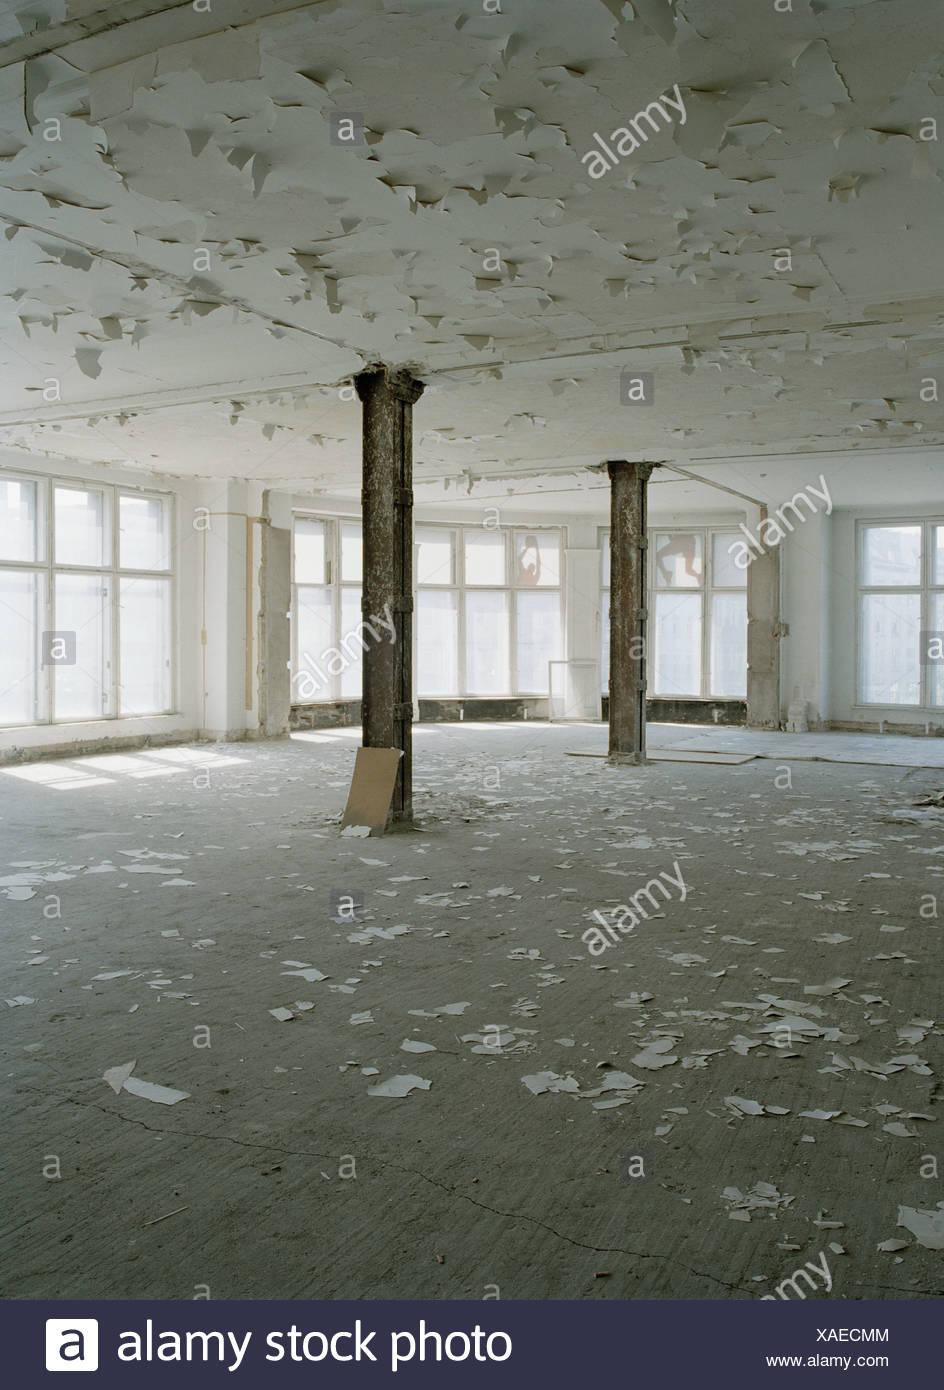 A room in disrepair - Stock Image